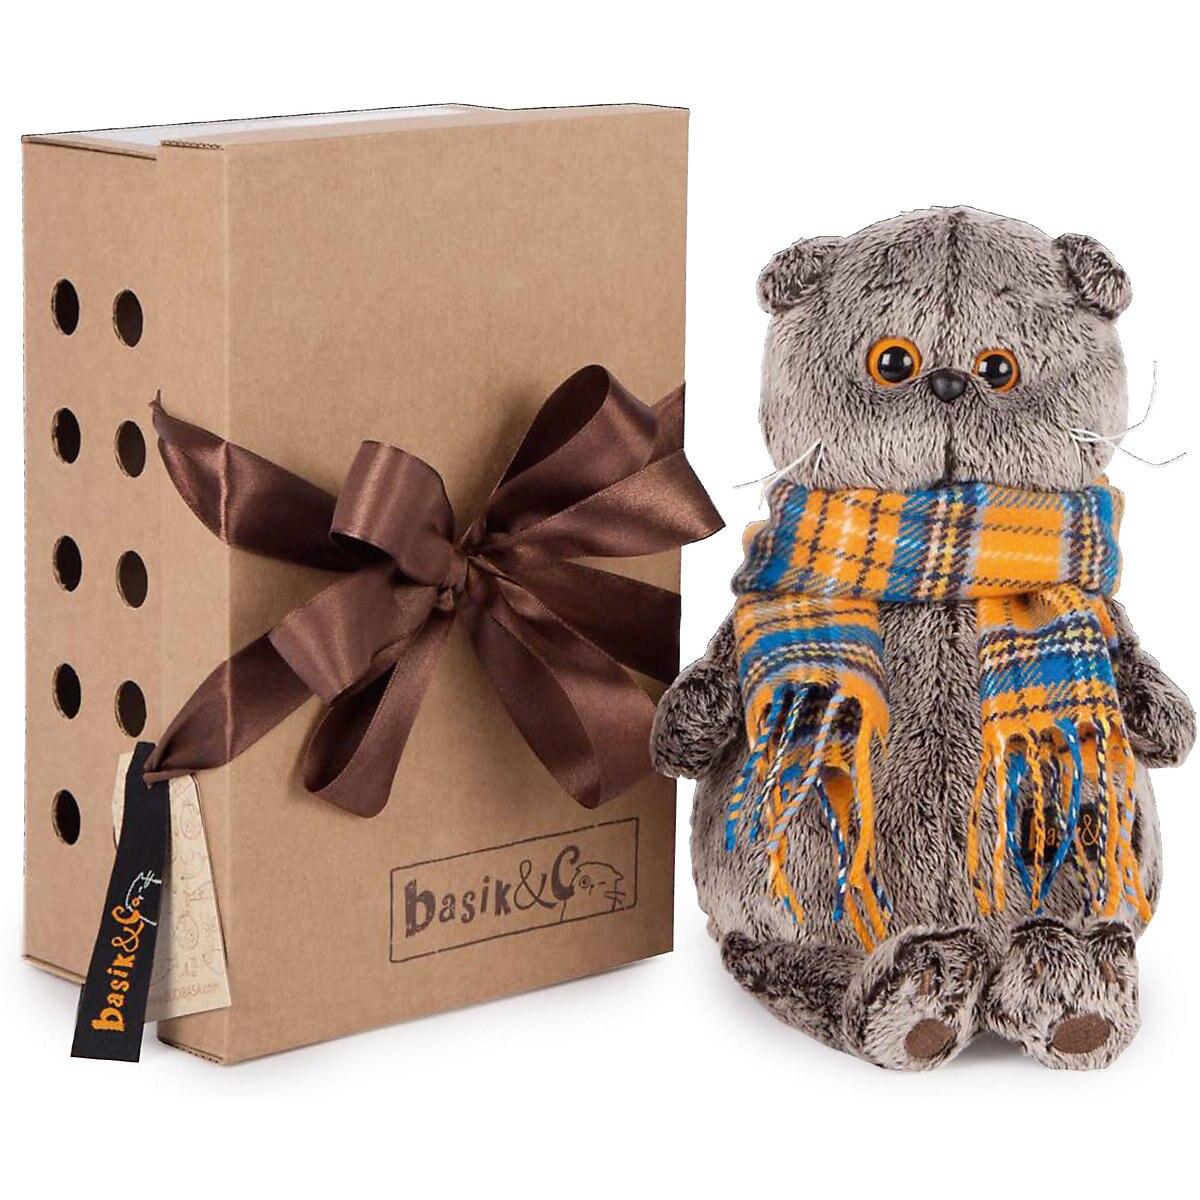 Stuffed & Plush Animals BUDI BASA 8999599 Stitch Bear Totoro Giraffe Fox Cat Dog Soft Children's toys - 5